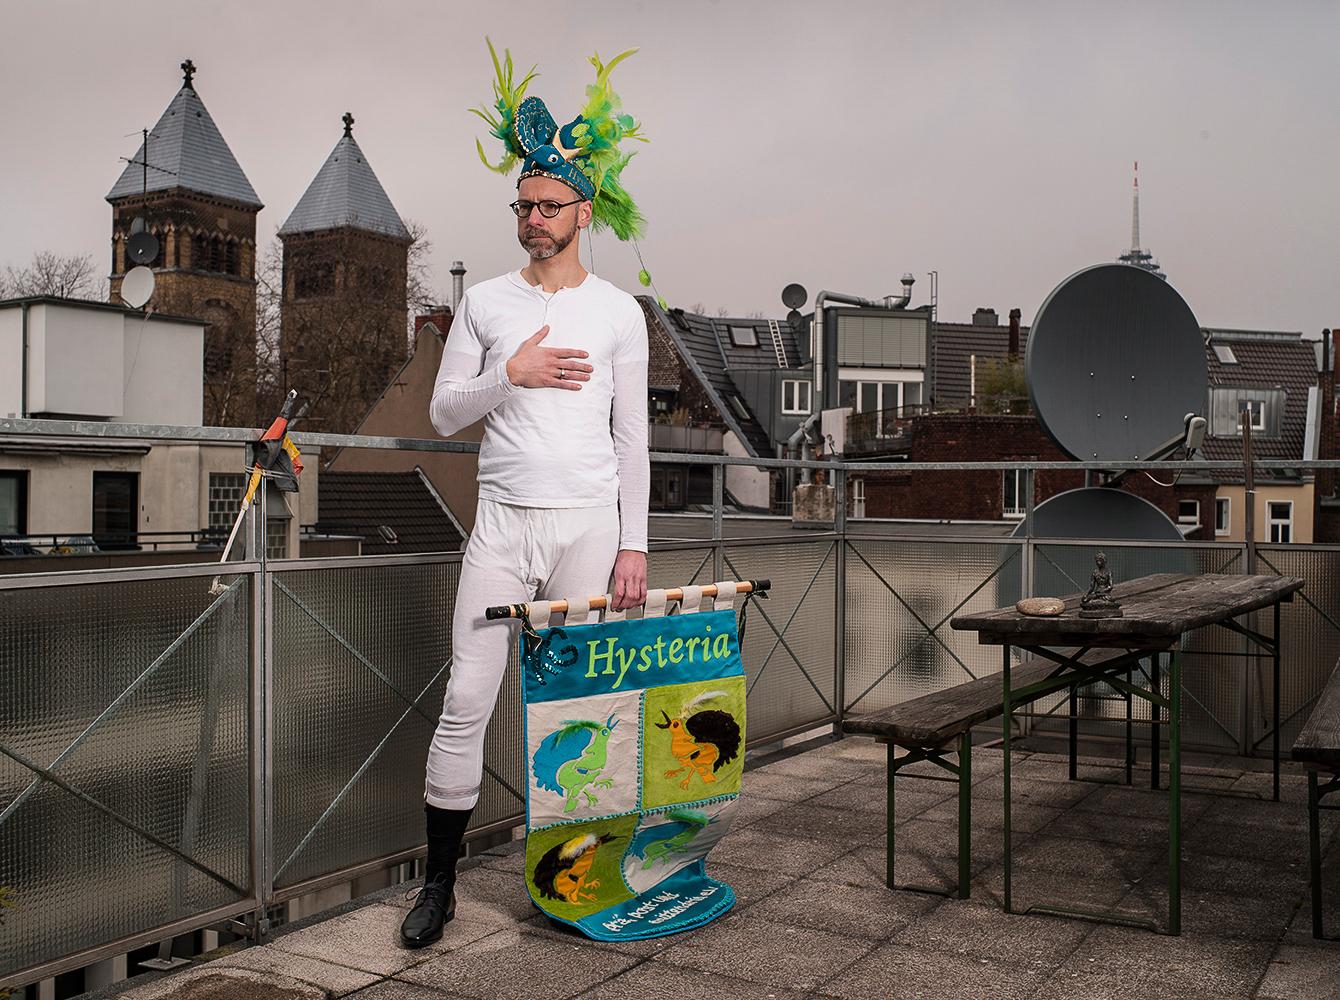 KG Hysteria, Thomas Wallenhorst